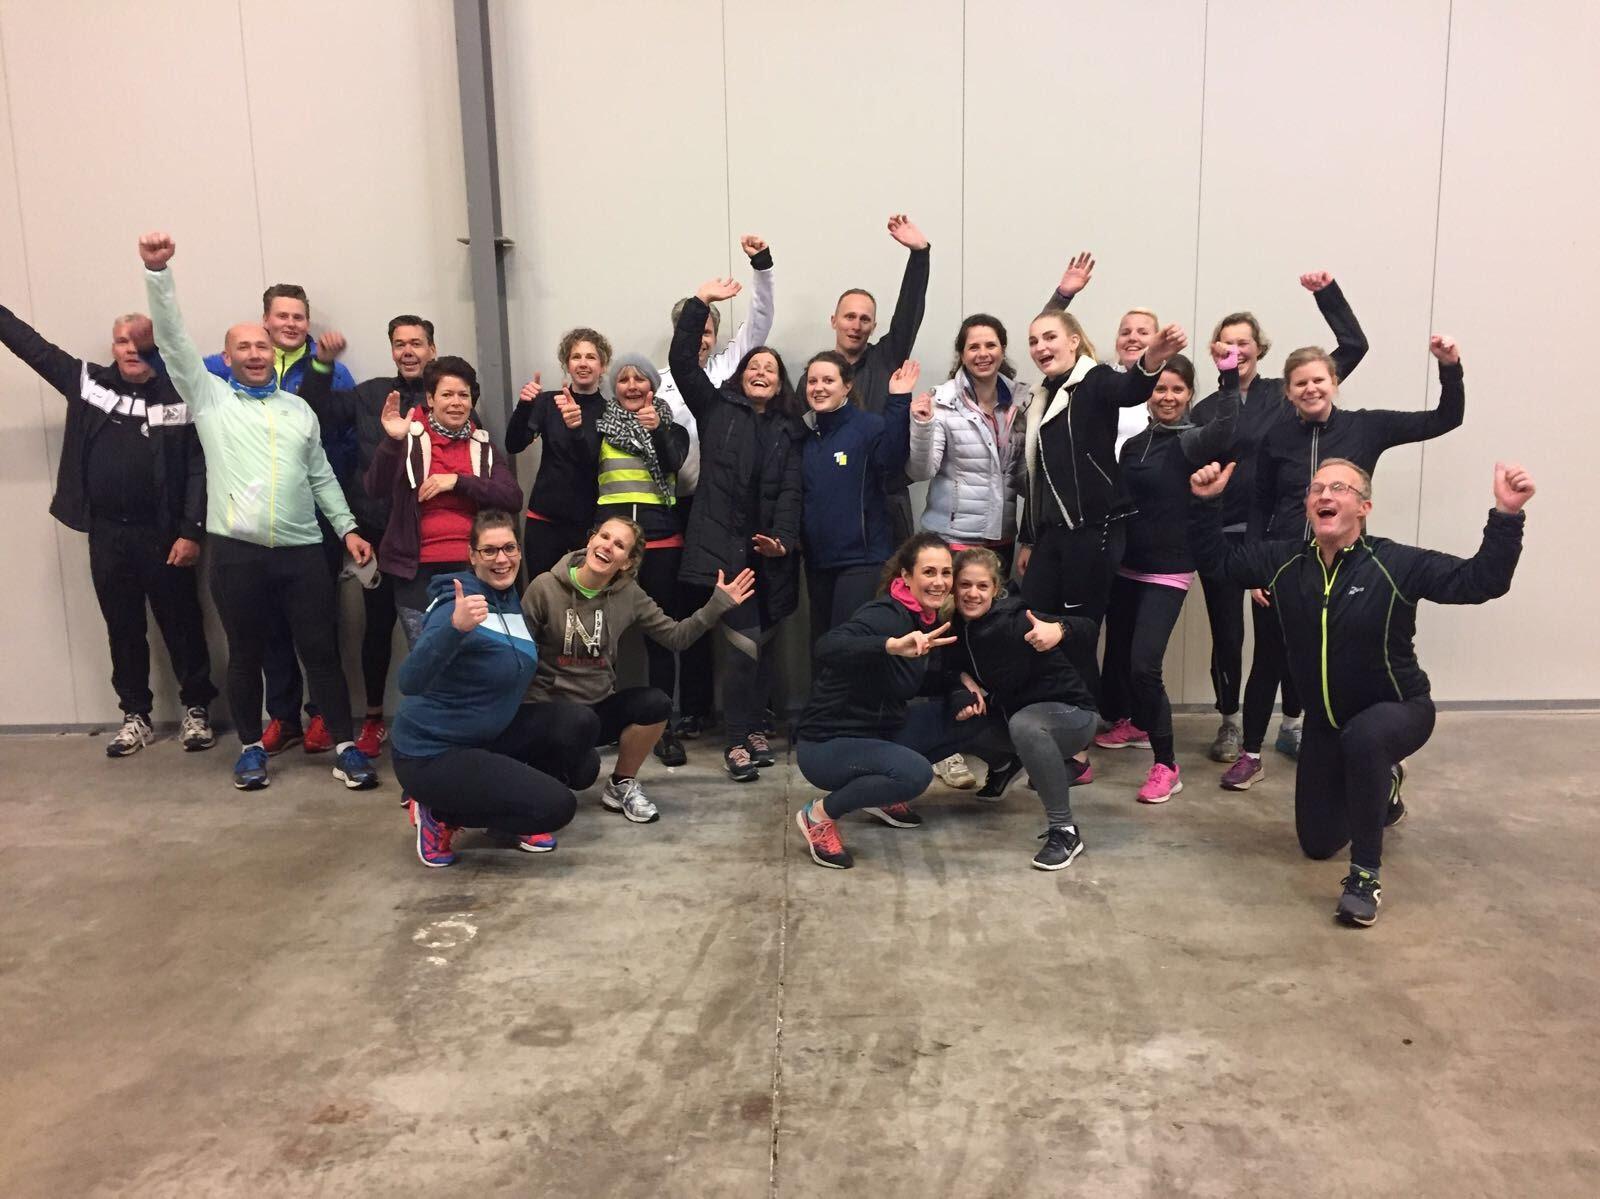 Bootwalk en DISQ-training op de vrijdagmiddag